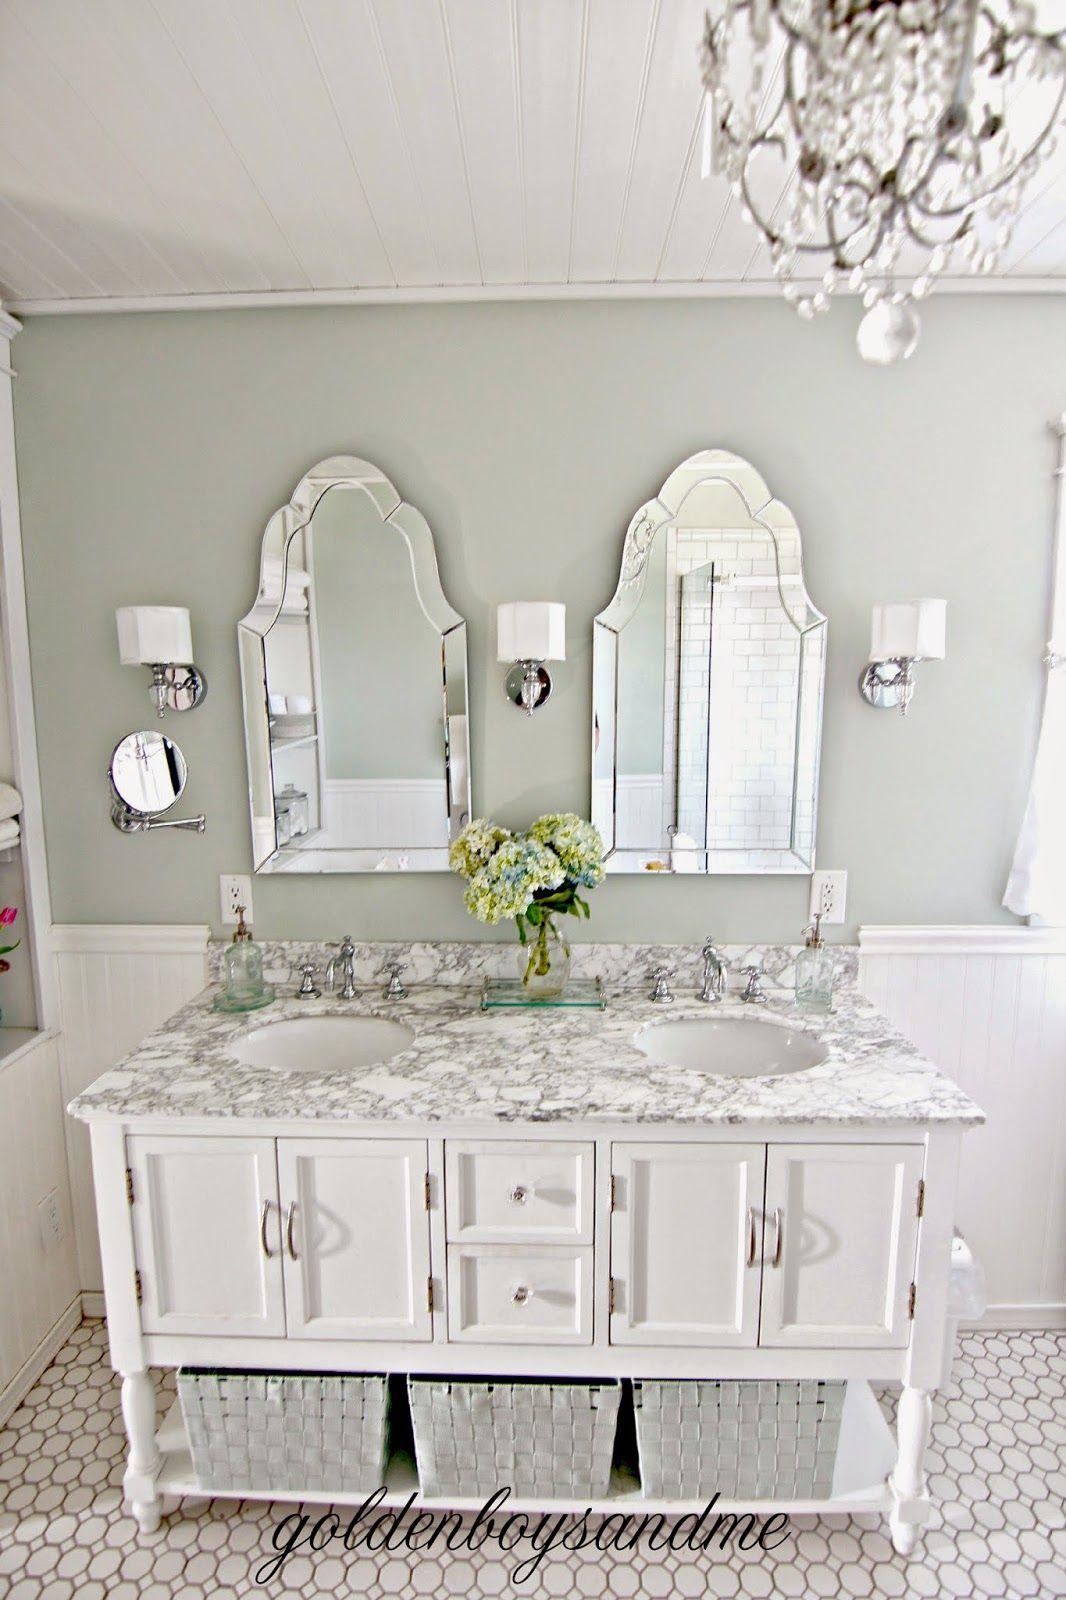 DIY master bathroom vanity with Beverly vanity and carrera marble countertop-www.goldenboysandme.com